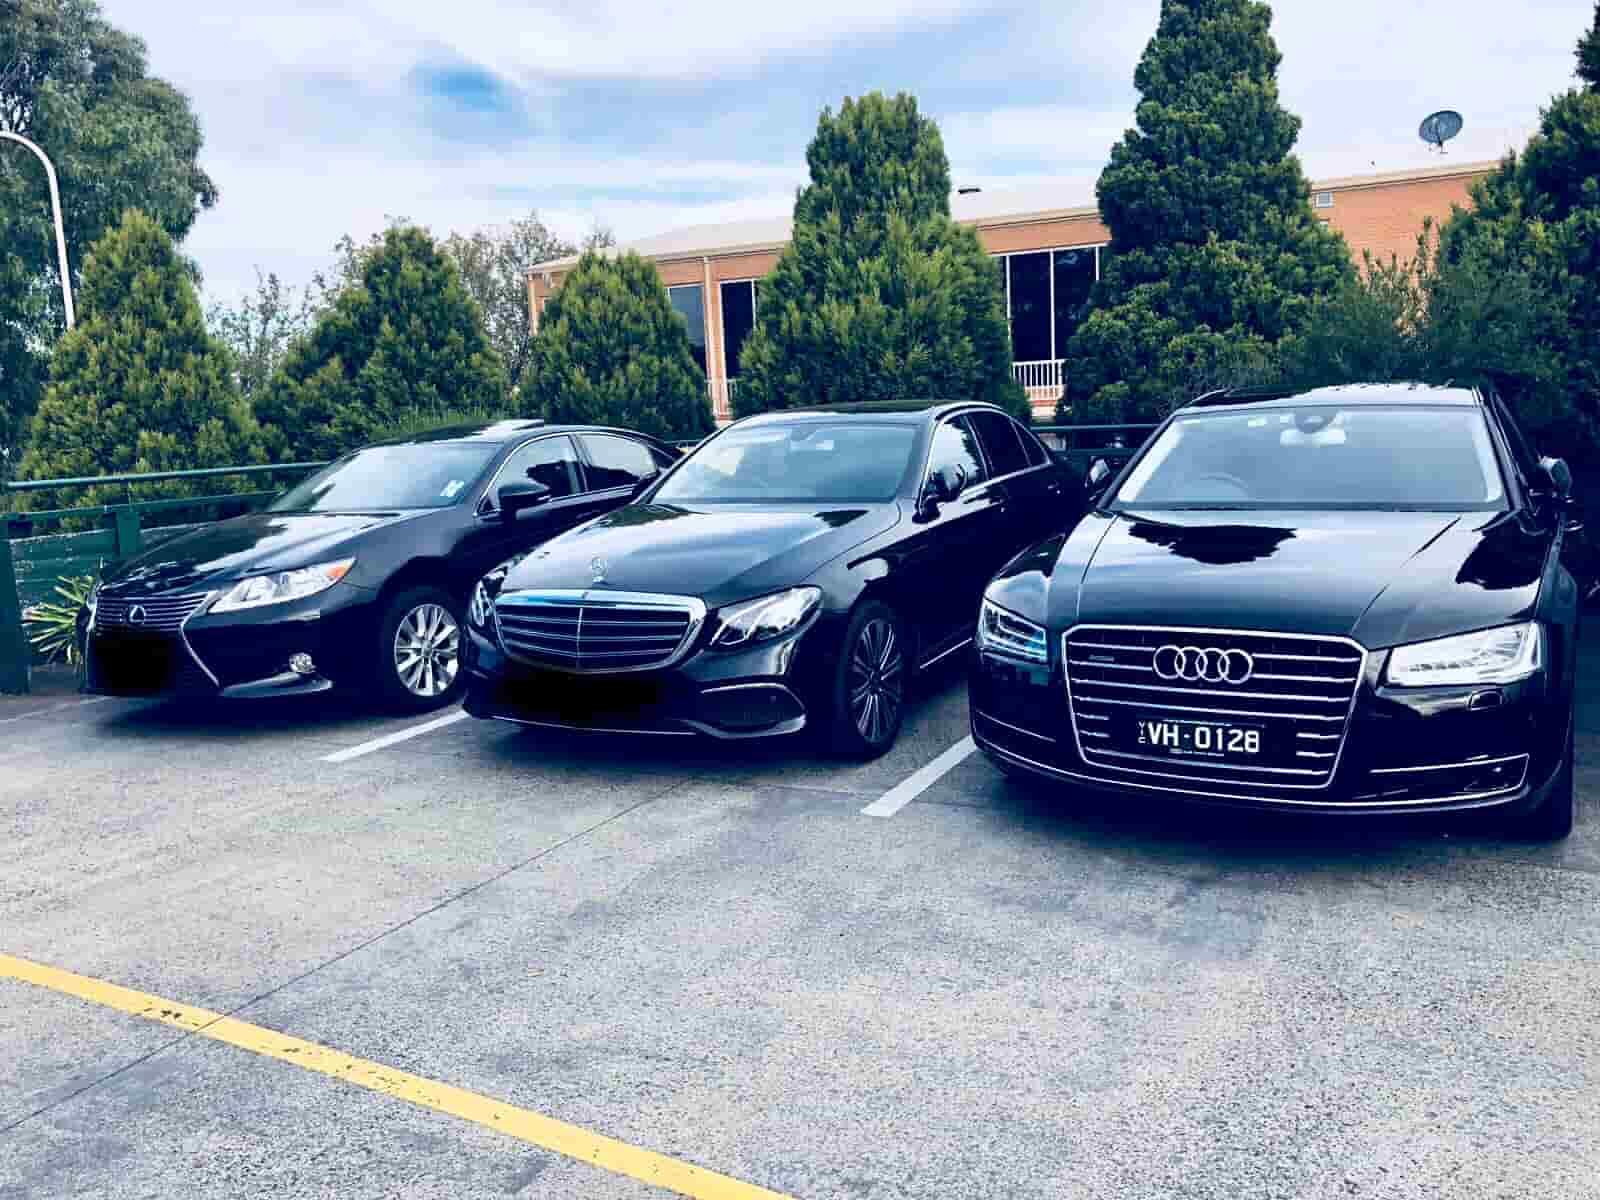 Chauffeur Link Melbourne Cars